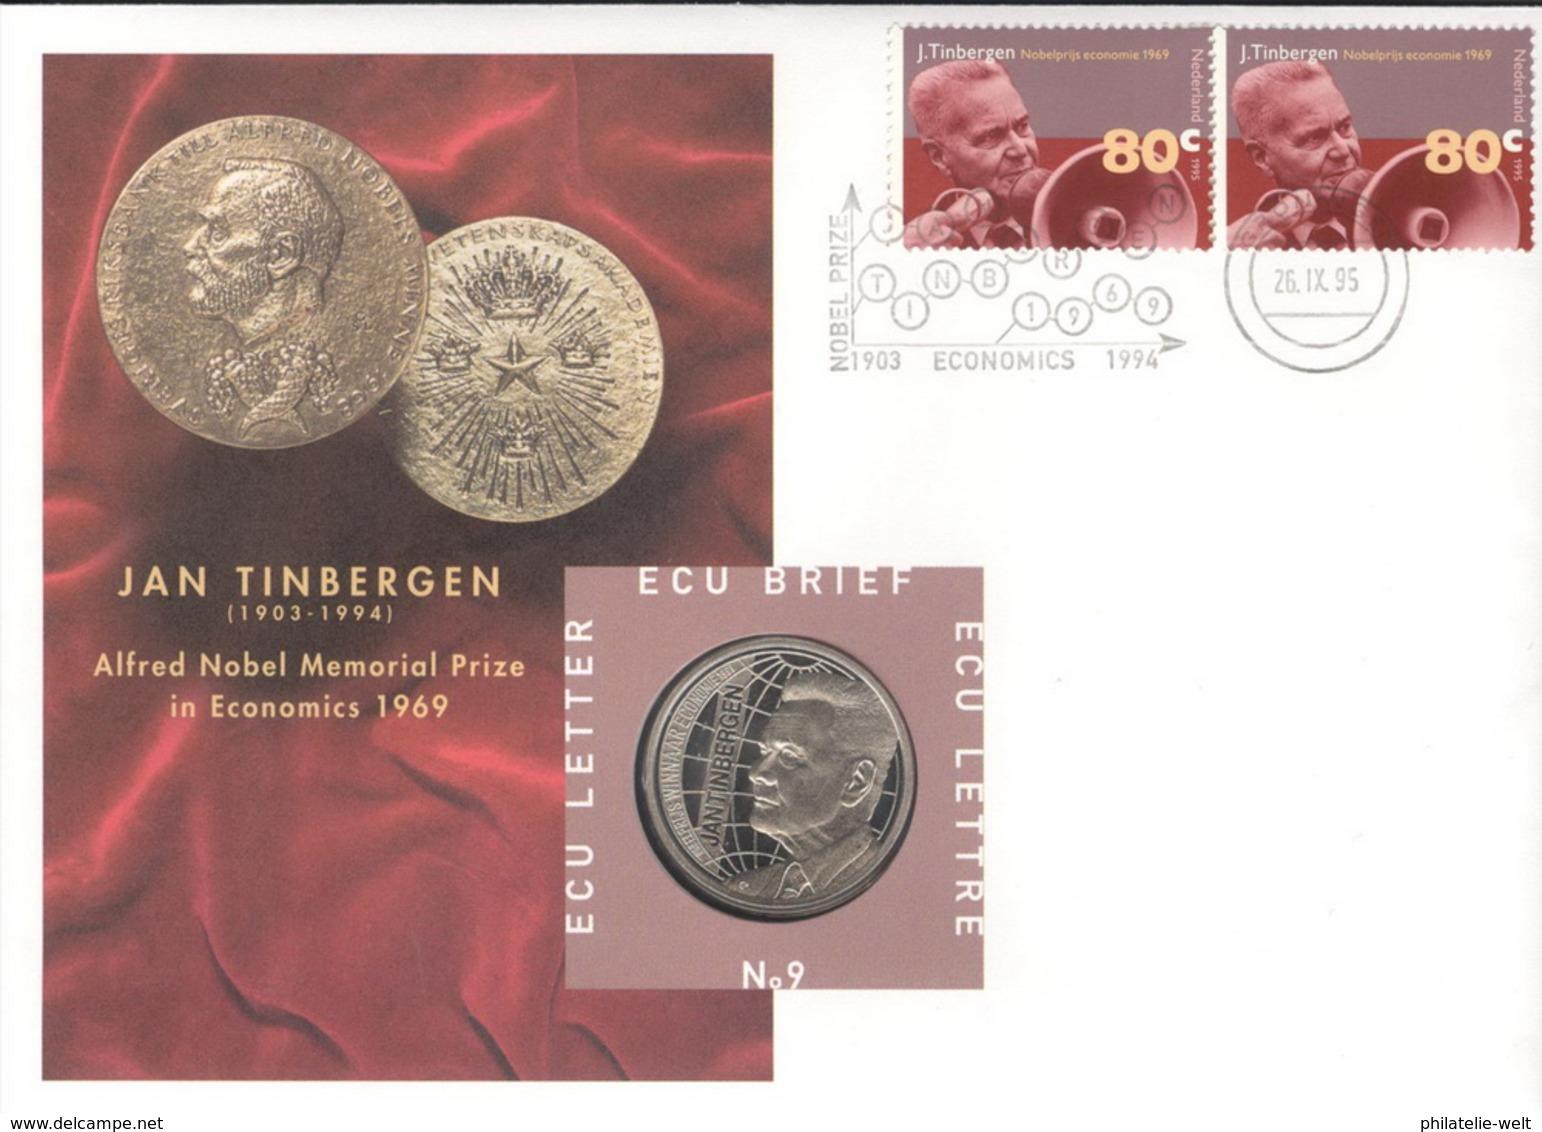 Niederlande Numisbrief ECU Nr. 9 - Niederlande